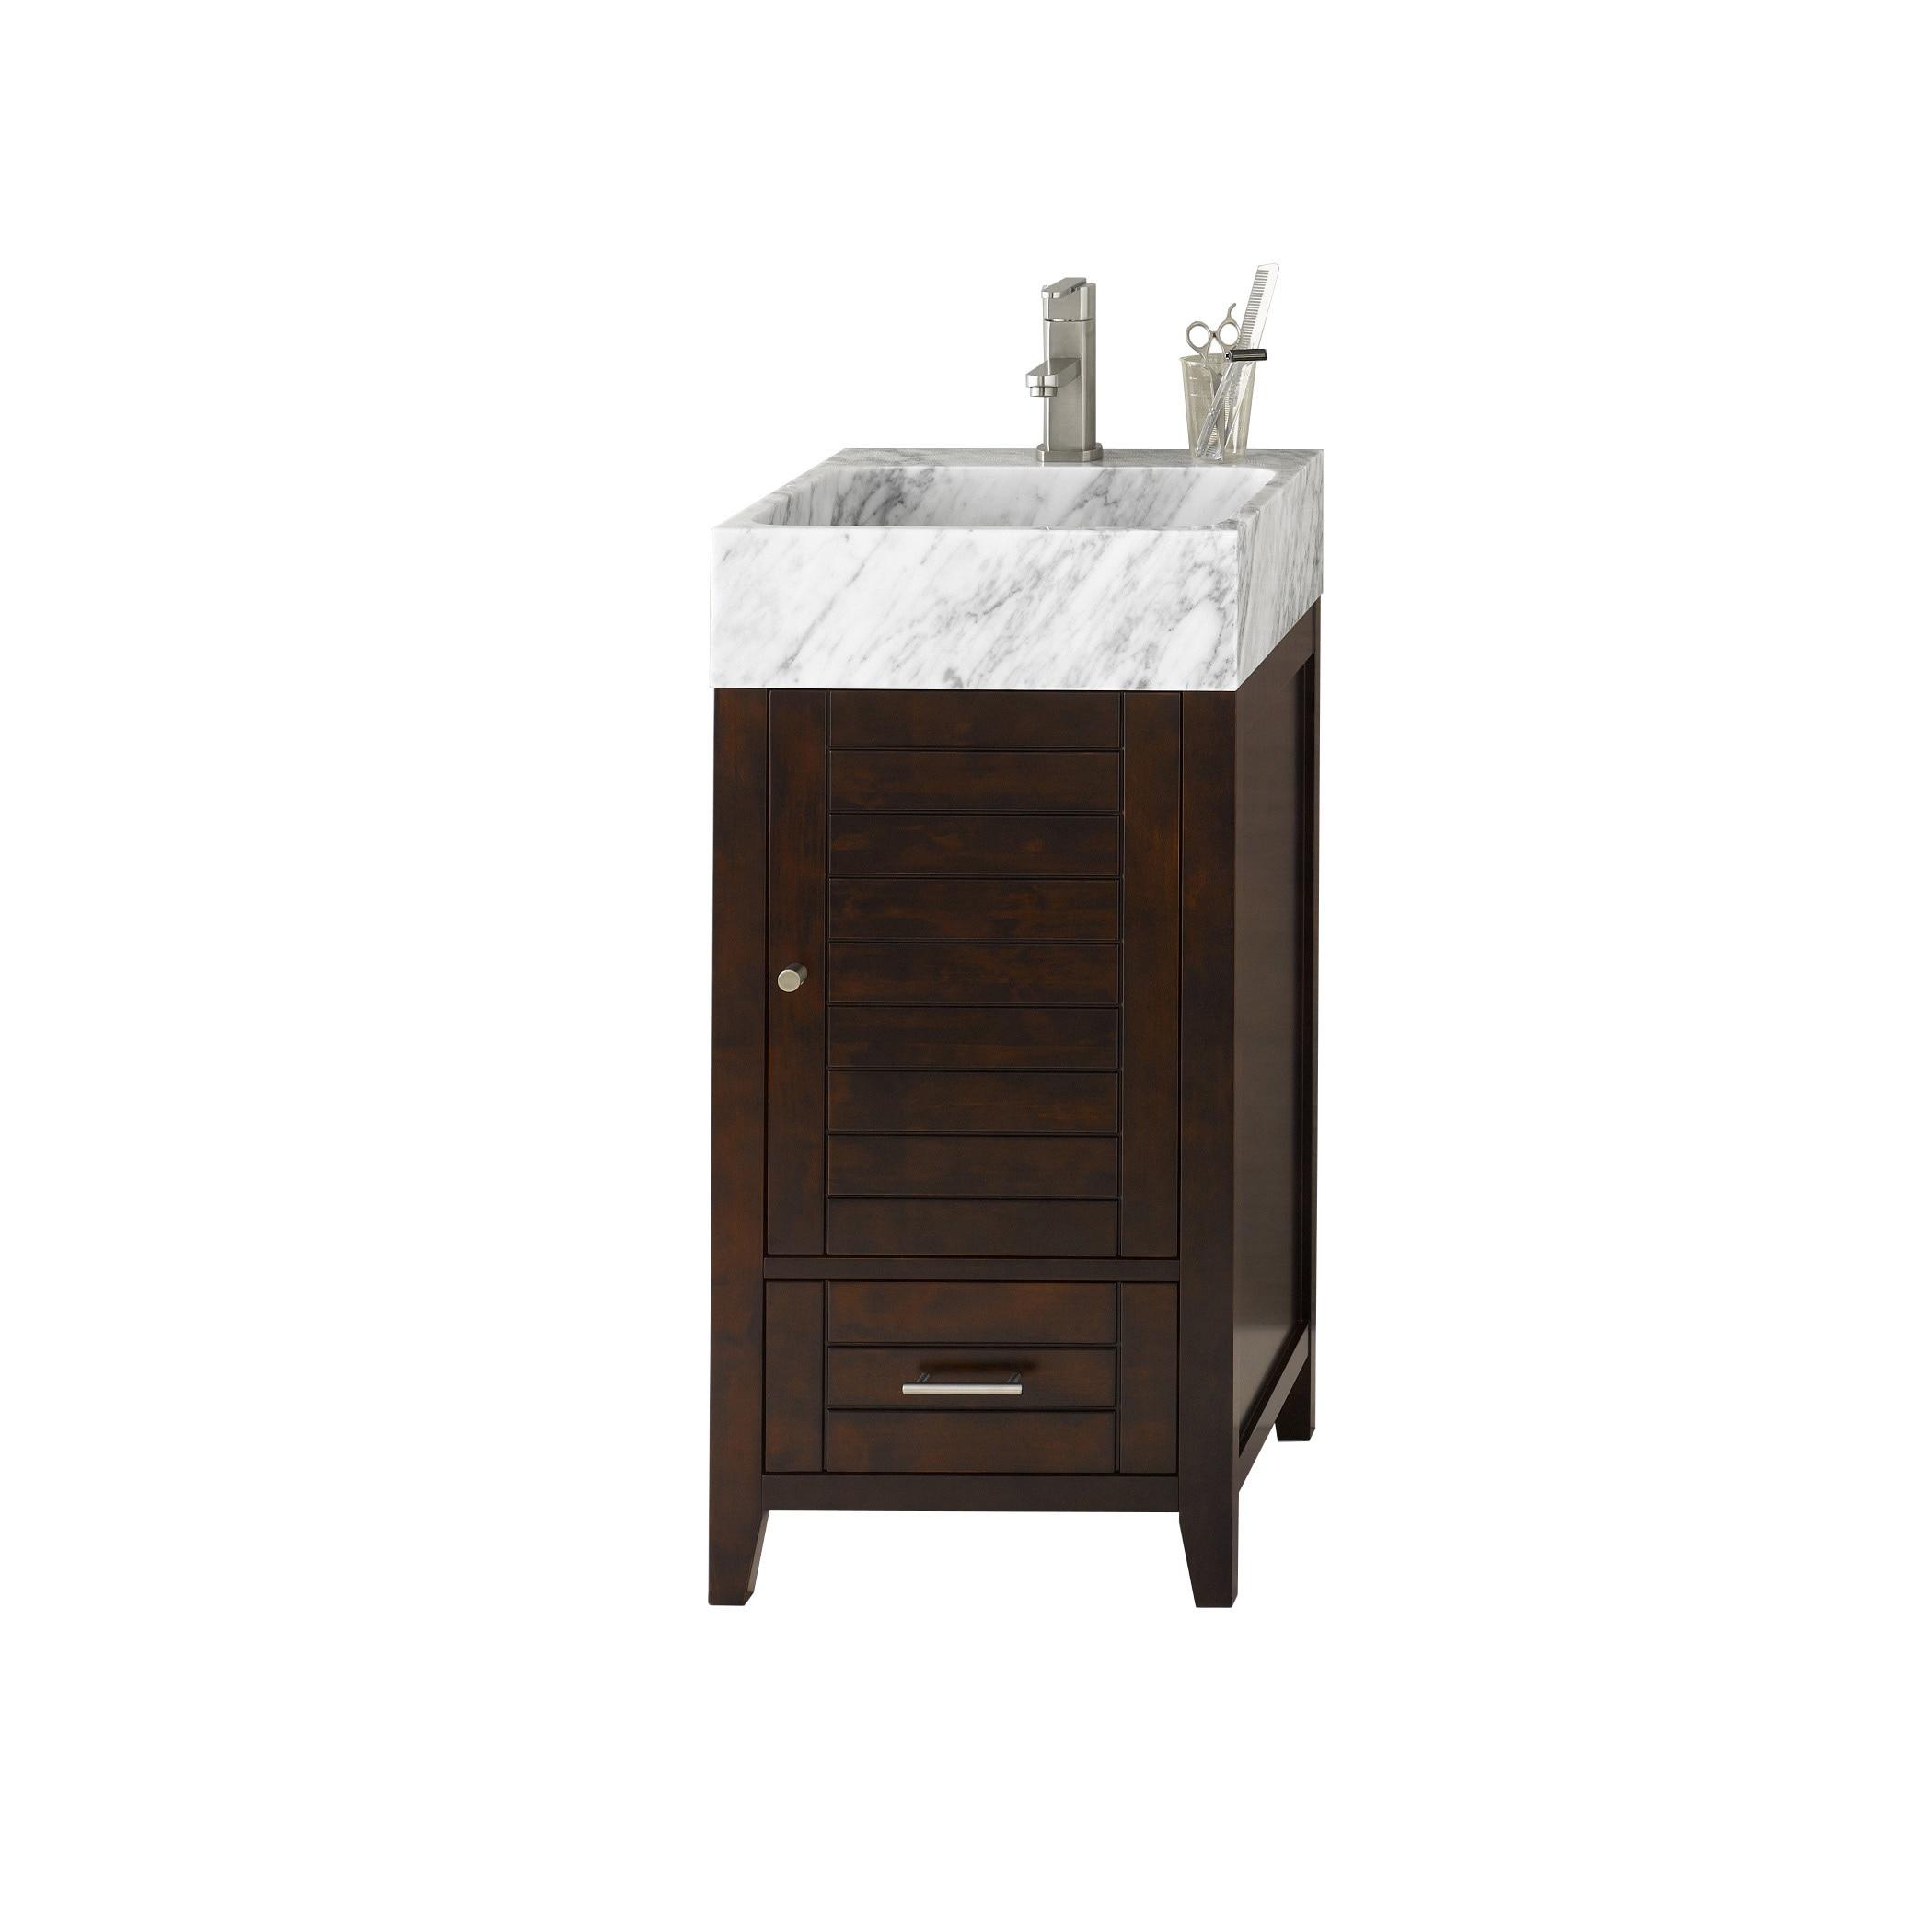 Shop Ronbow Elise Vintage Walnut 18-inch Bathroom Vanity Set with ...